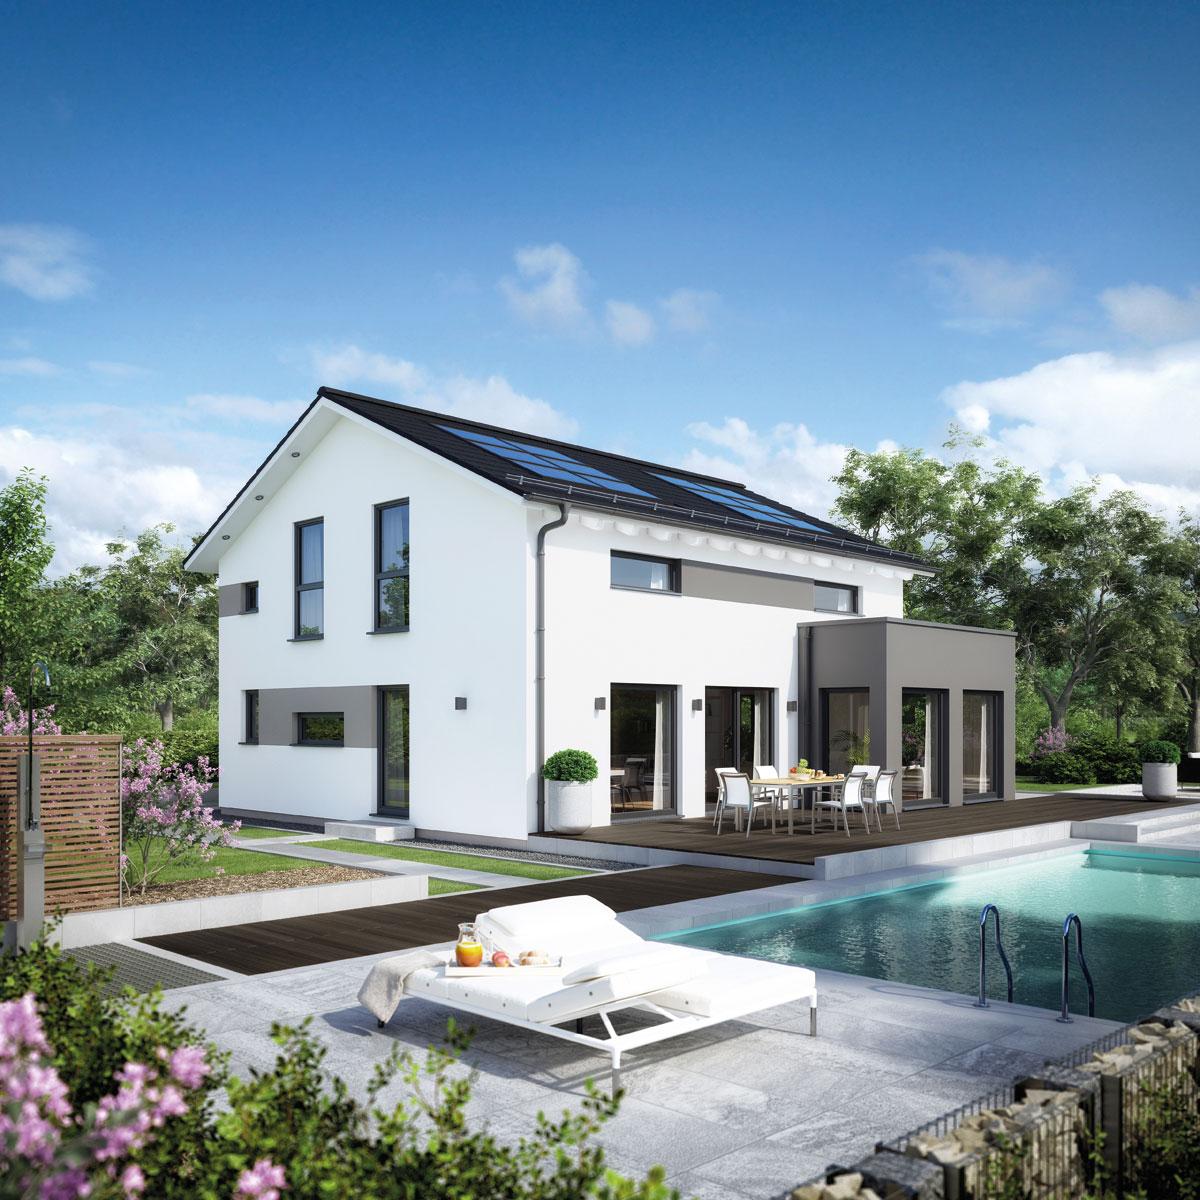 Musterhaus Ulm In Energieeffizienter Kompaktbauweise Und Mit Eigenem  Swimmingpool